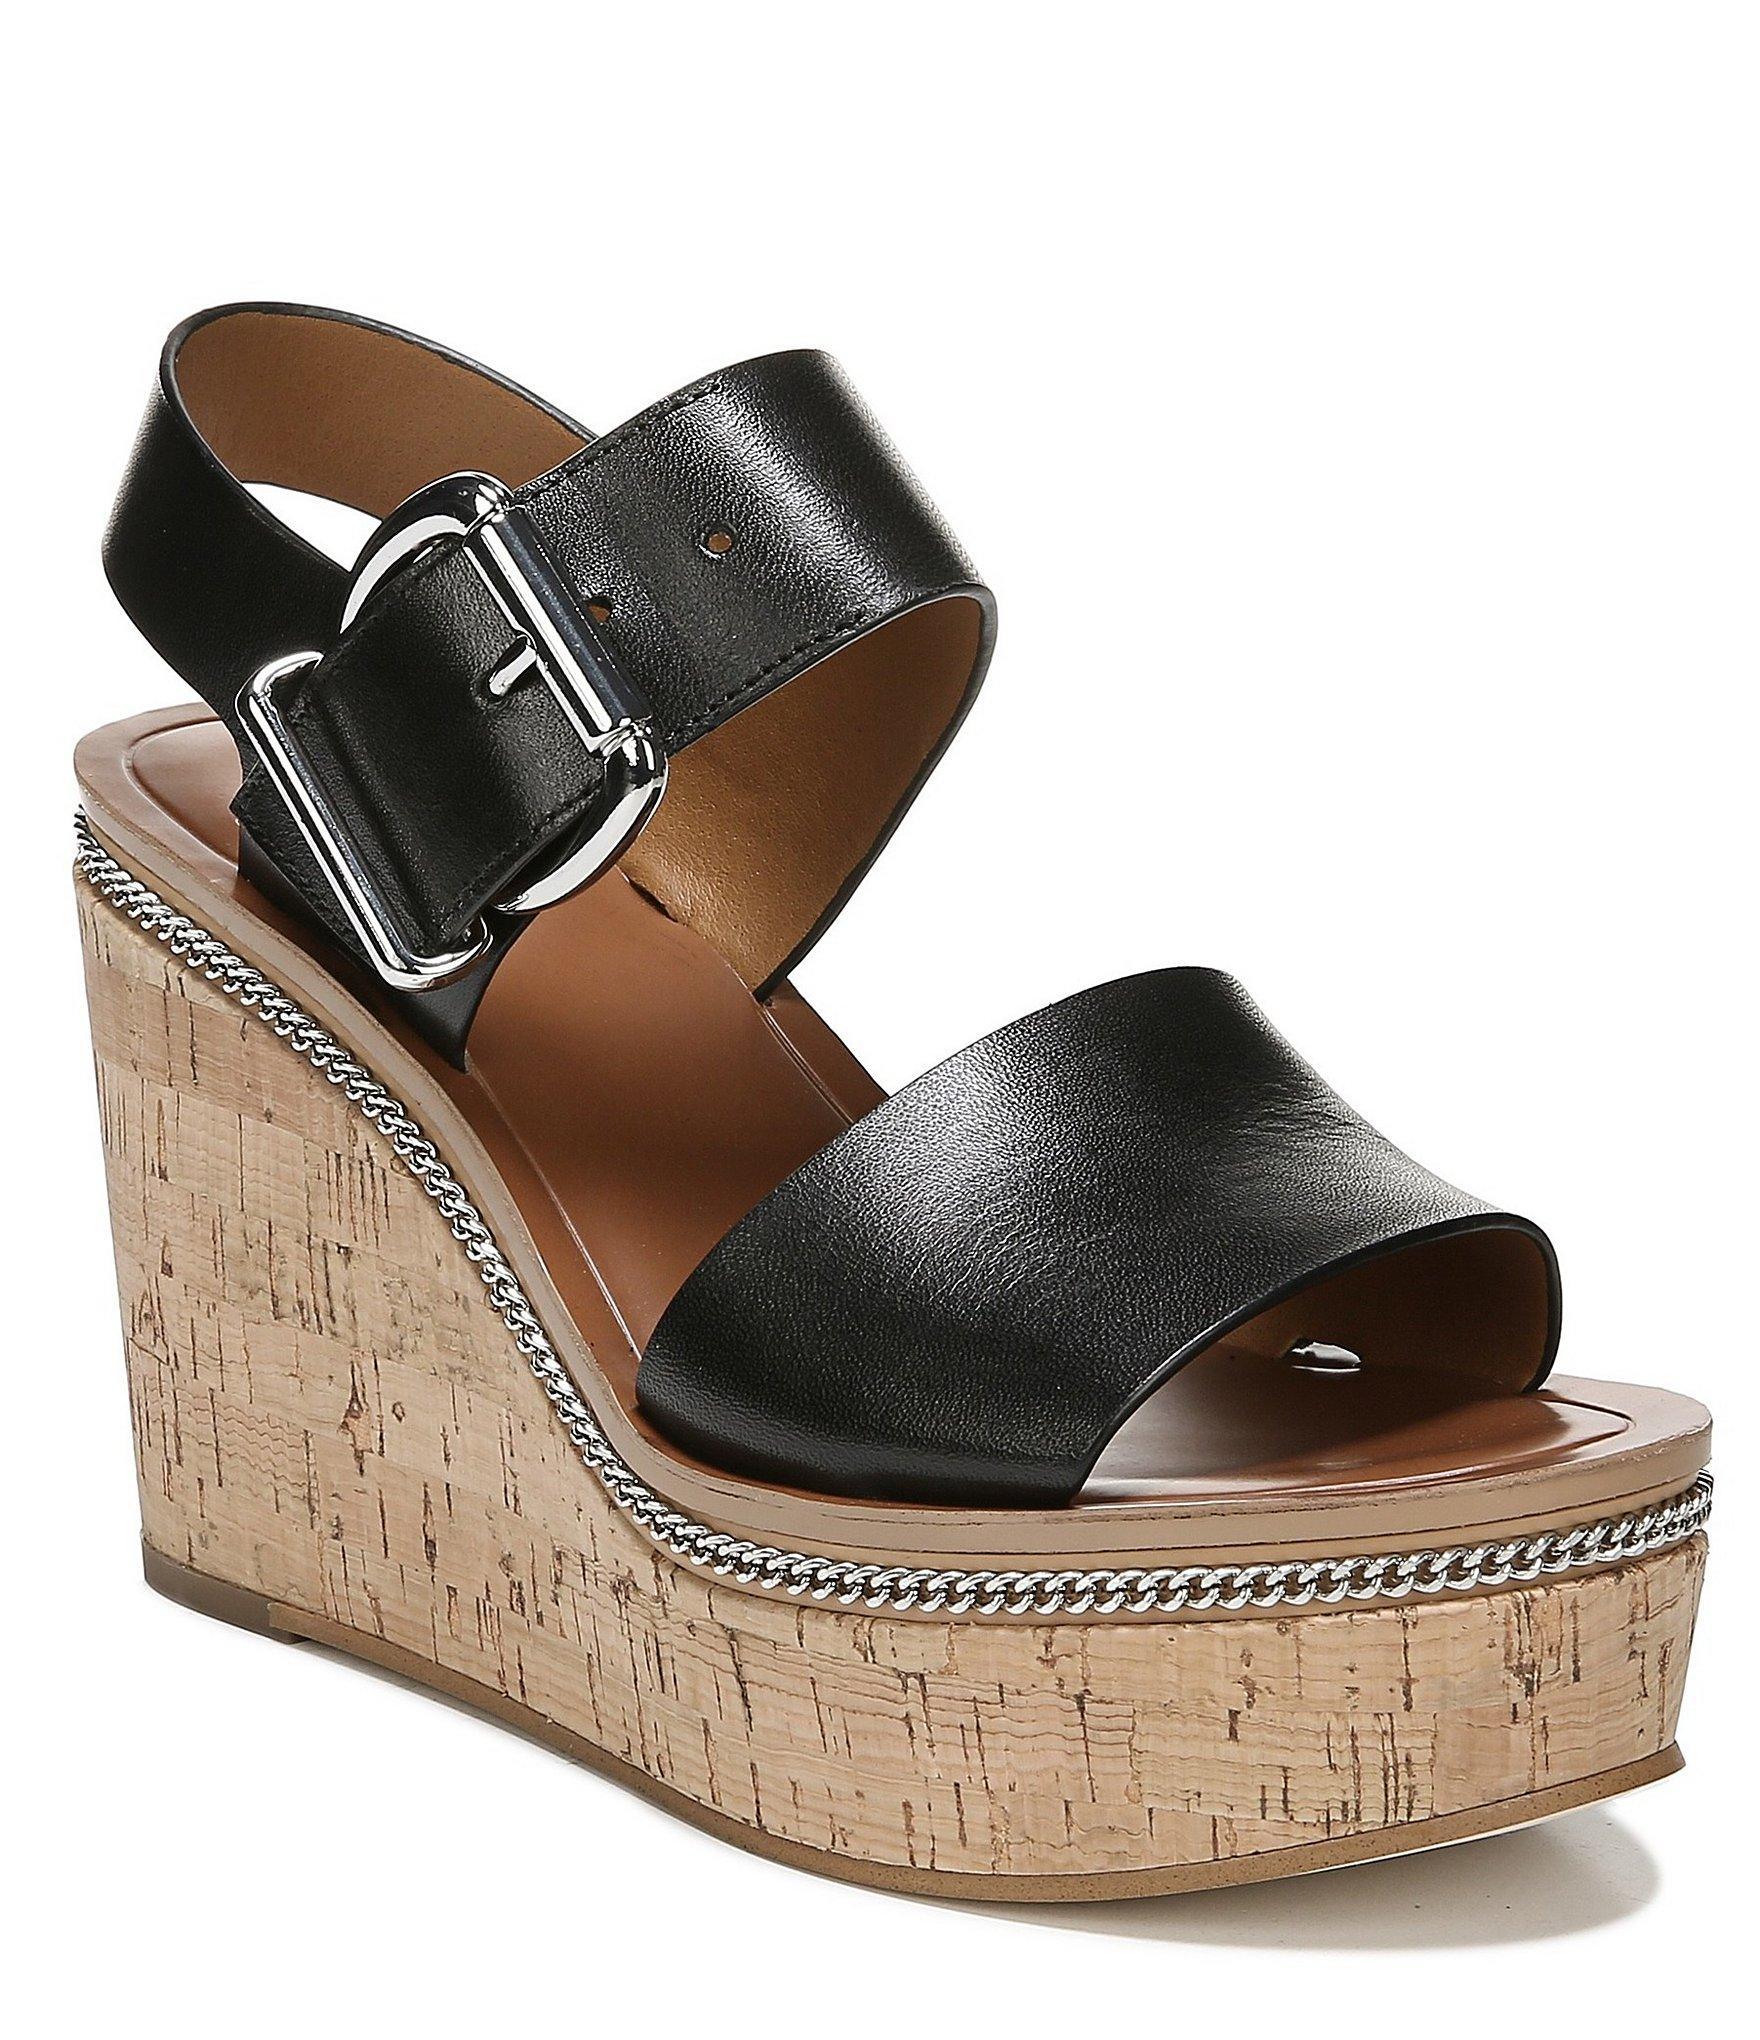 6f887c3eb53b Franco Sarto Sarto By Polly Leather Platform Wedge Sandals in Black ...